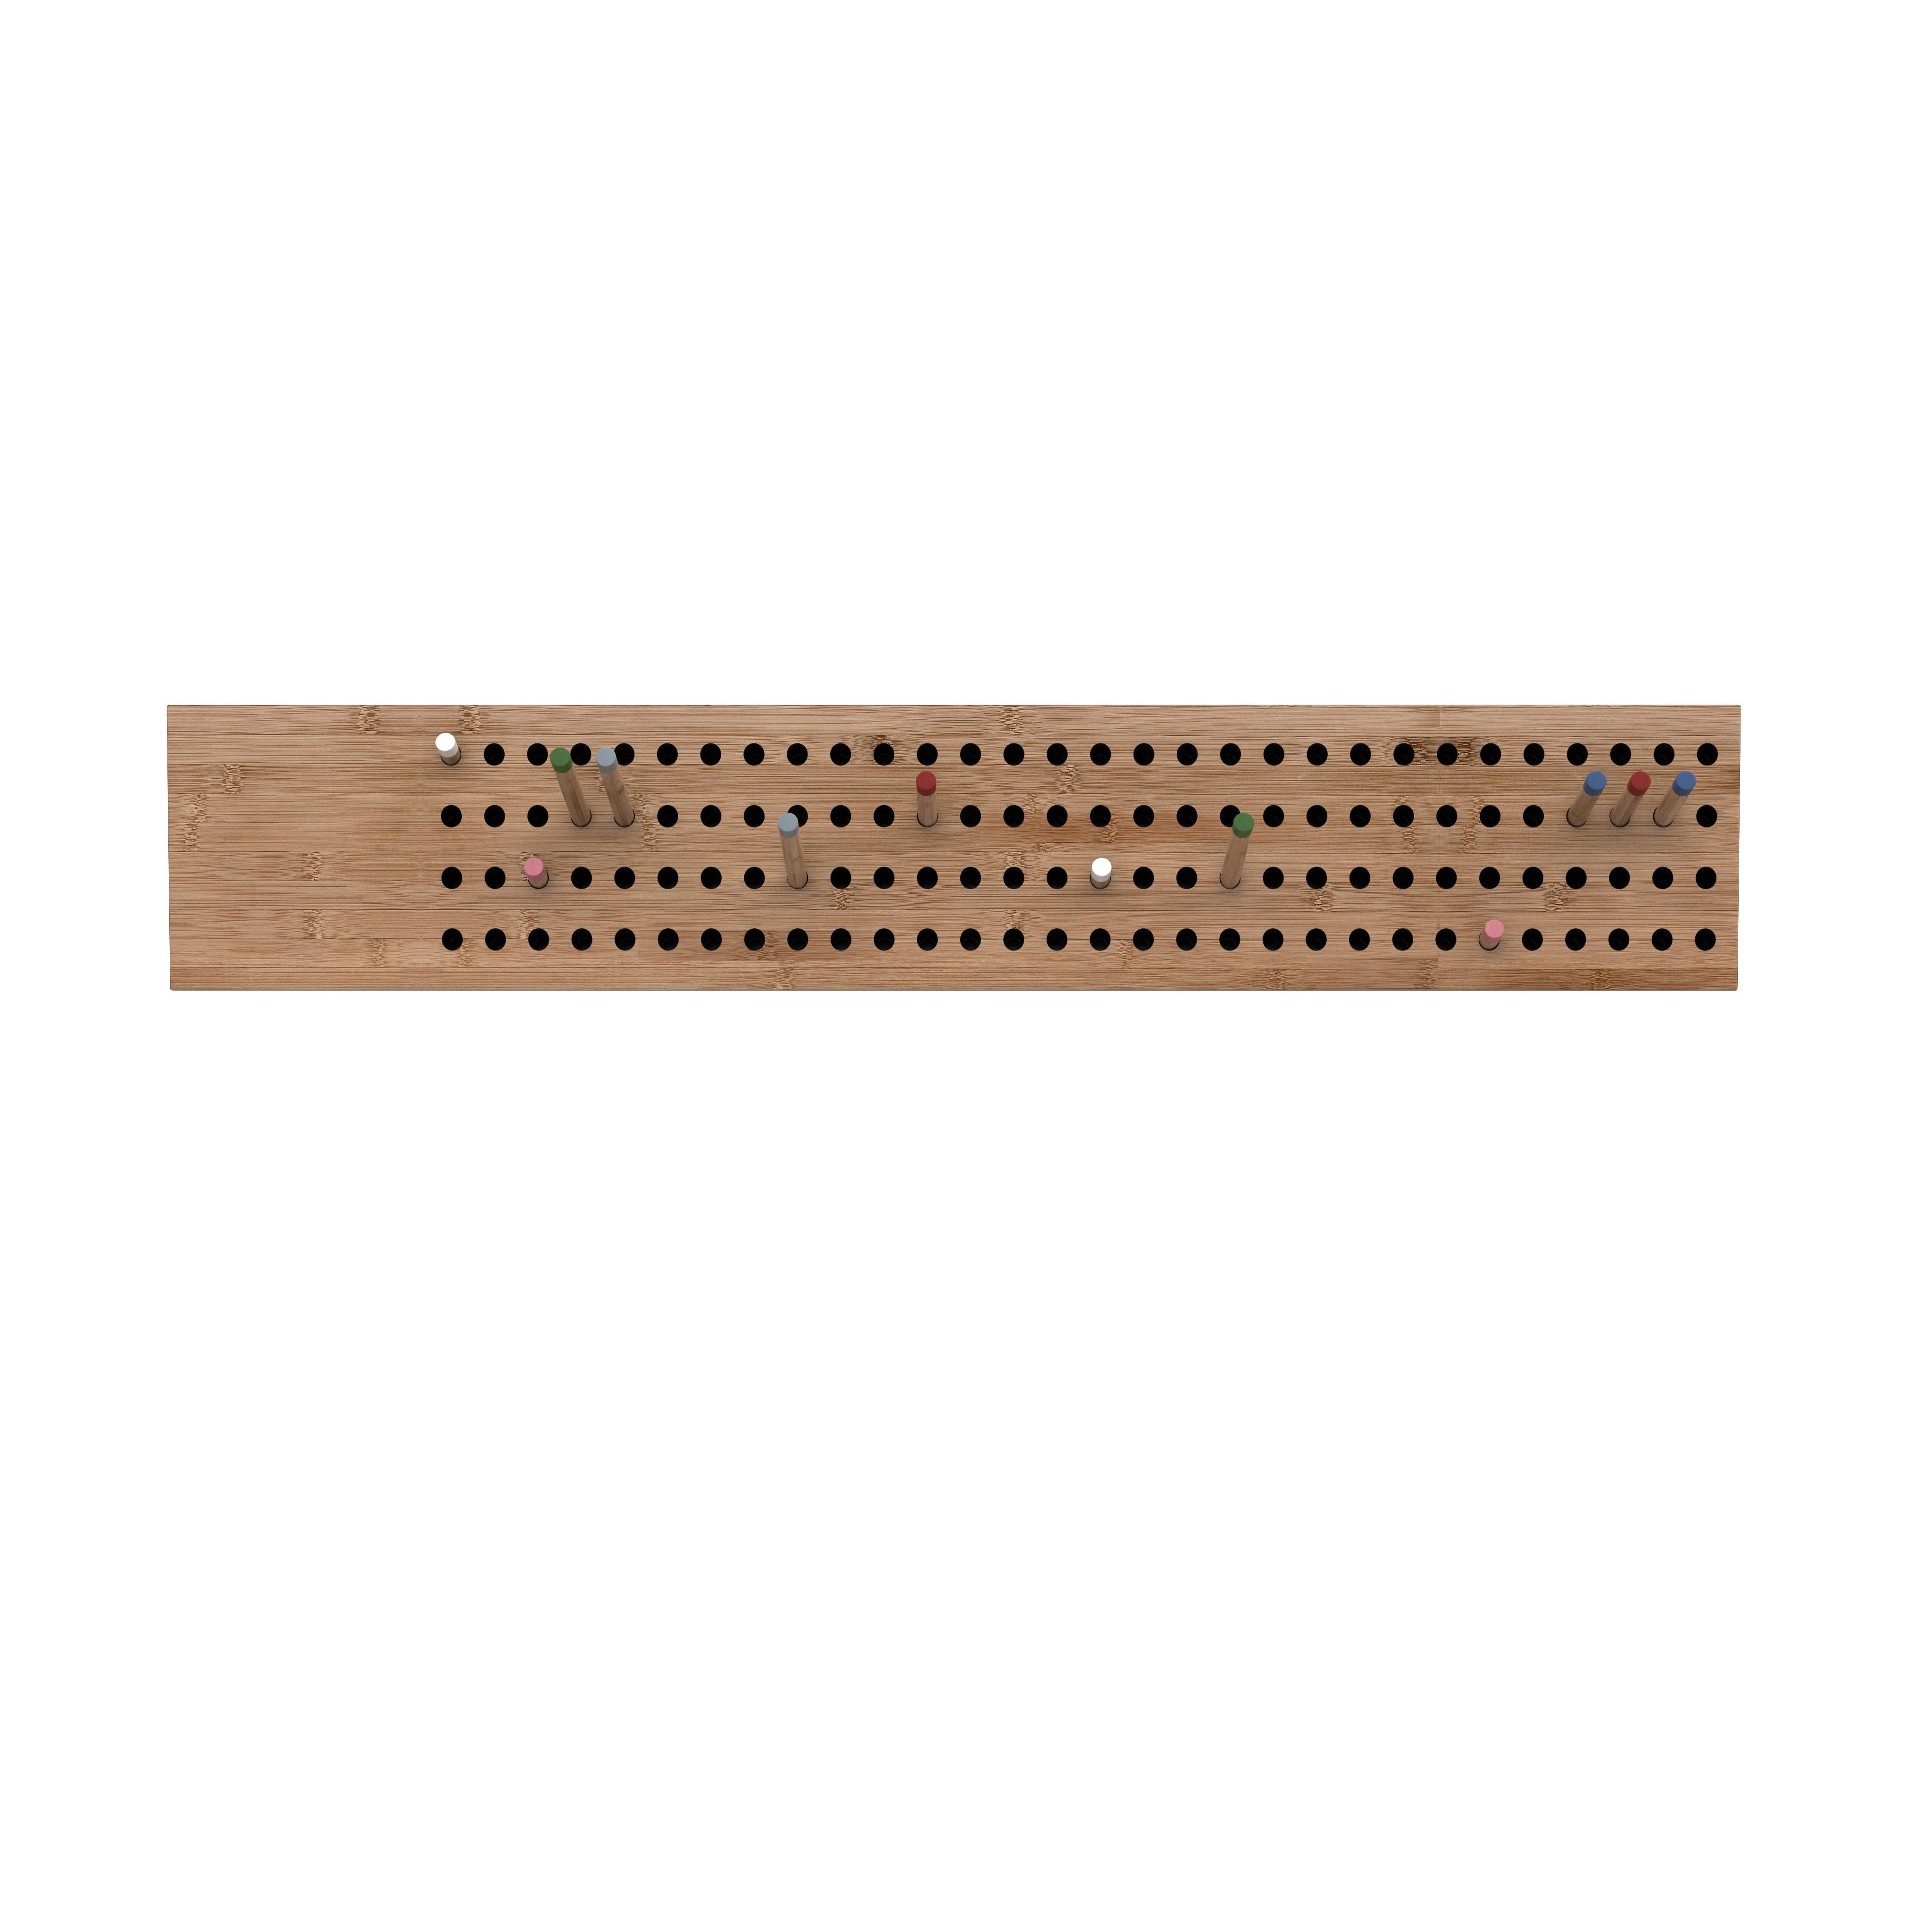 Gardarobe Scoredboard Large Horizontal-Bambusholz Nachhaltig - Kopieren - Kopieren 08